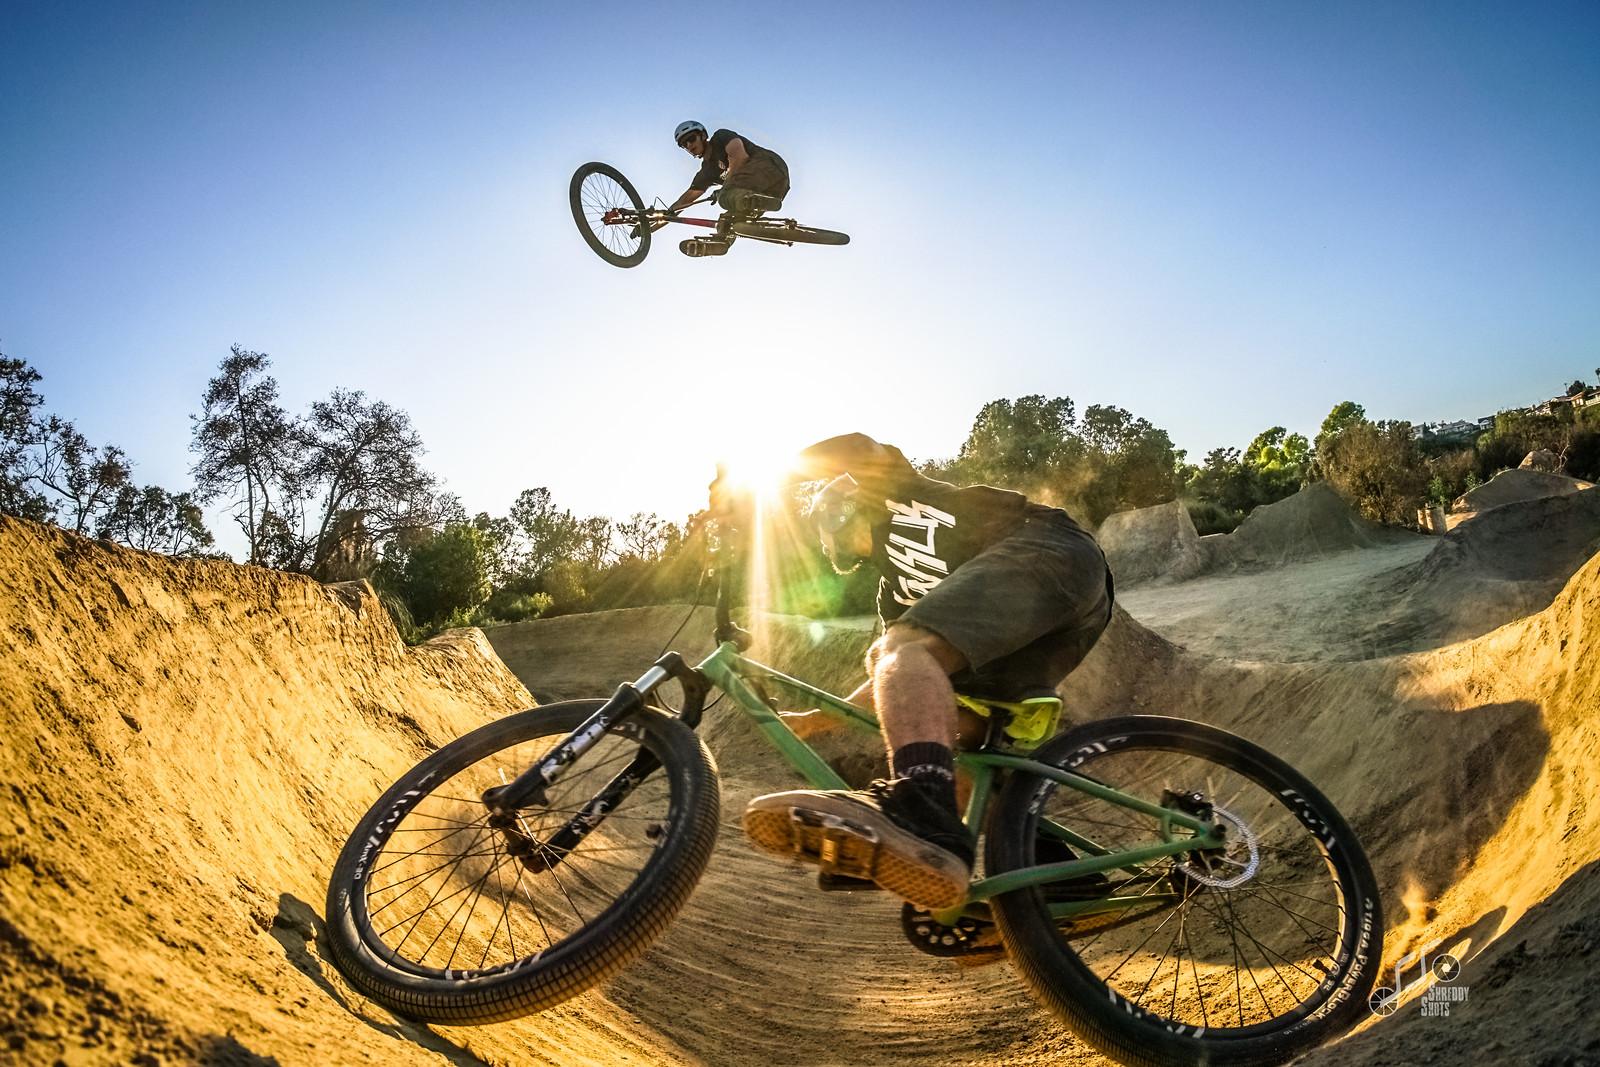 over under - shreddyshots - Mountain Biking Pictures - Vital MTB